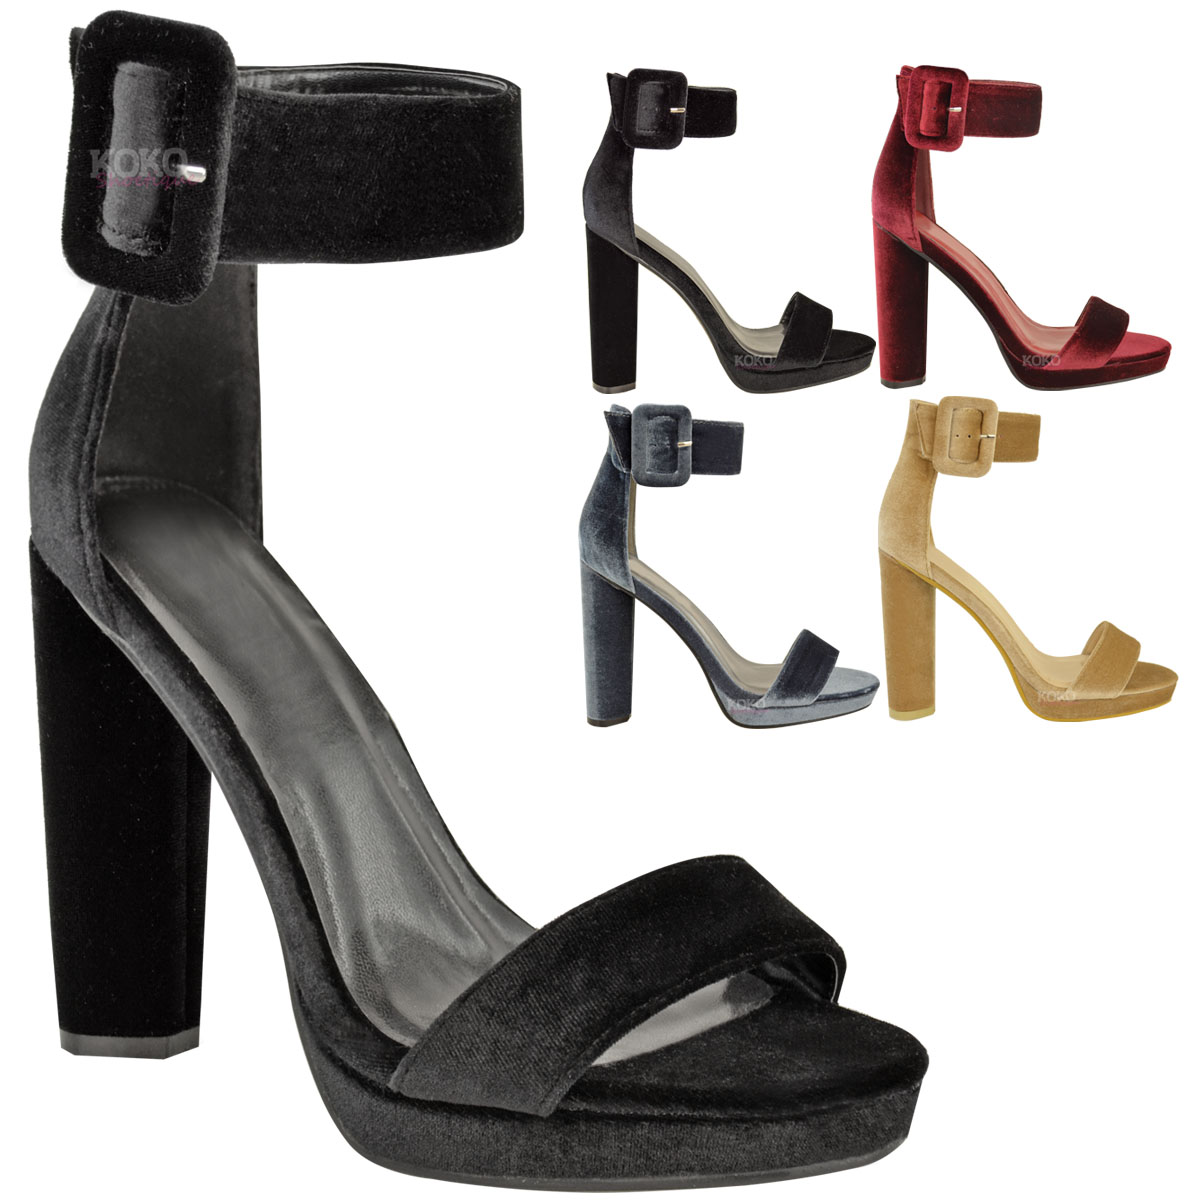 68 best Shoes high heels 2018 images on Pinterest Pumps 56